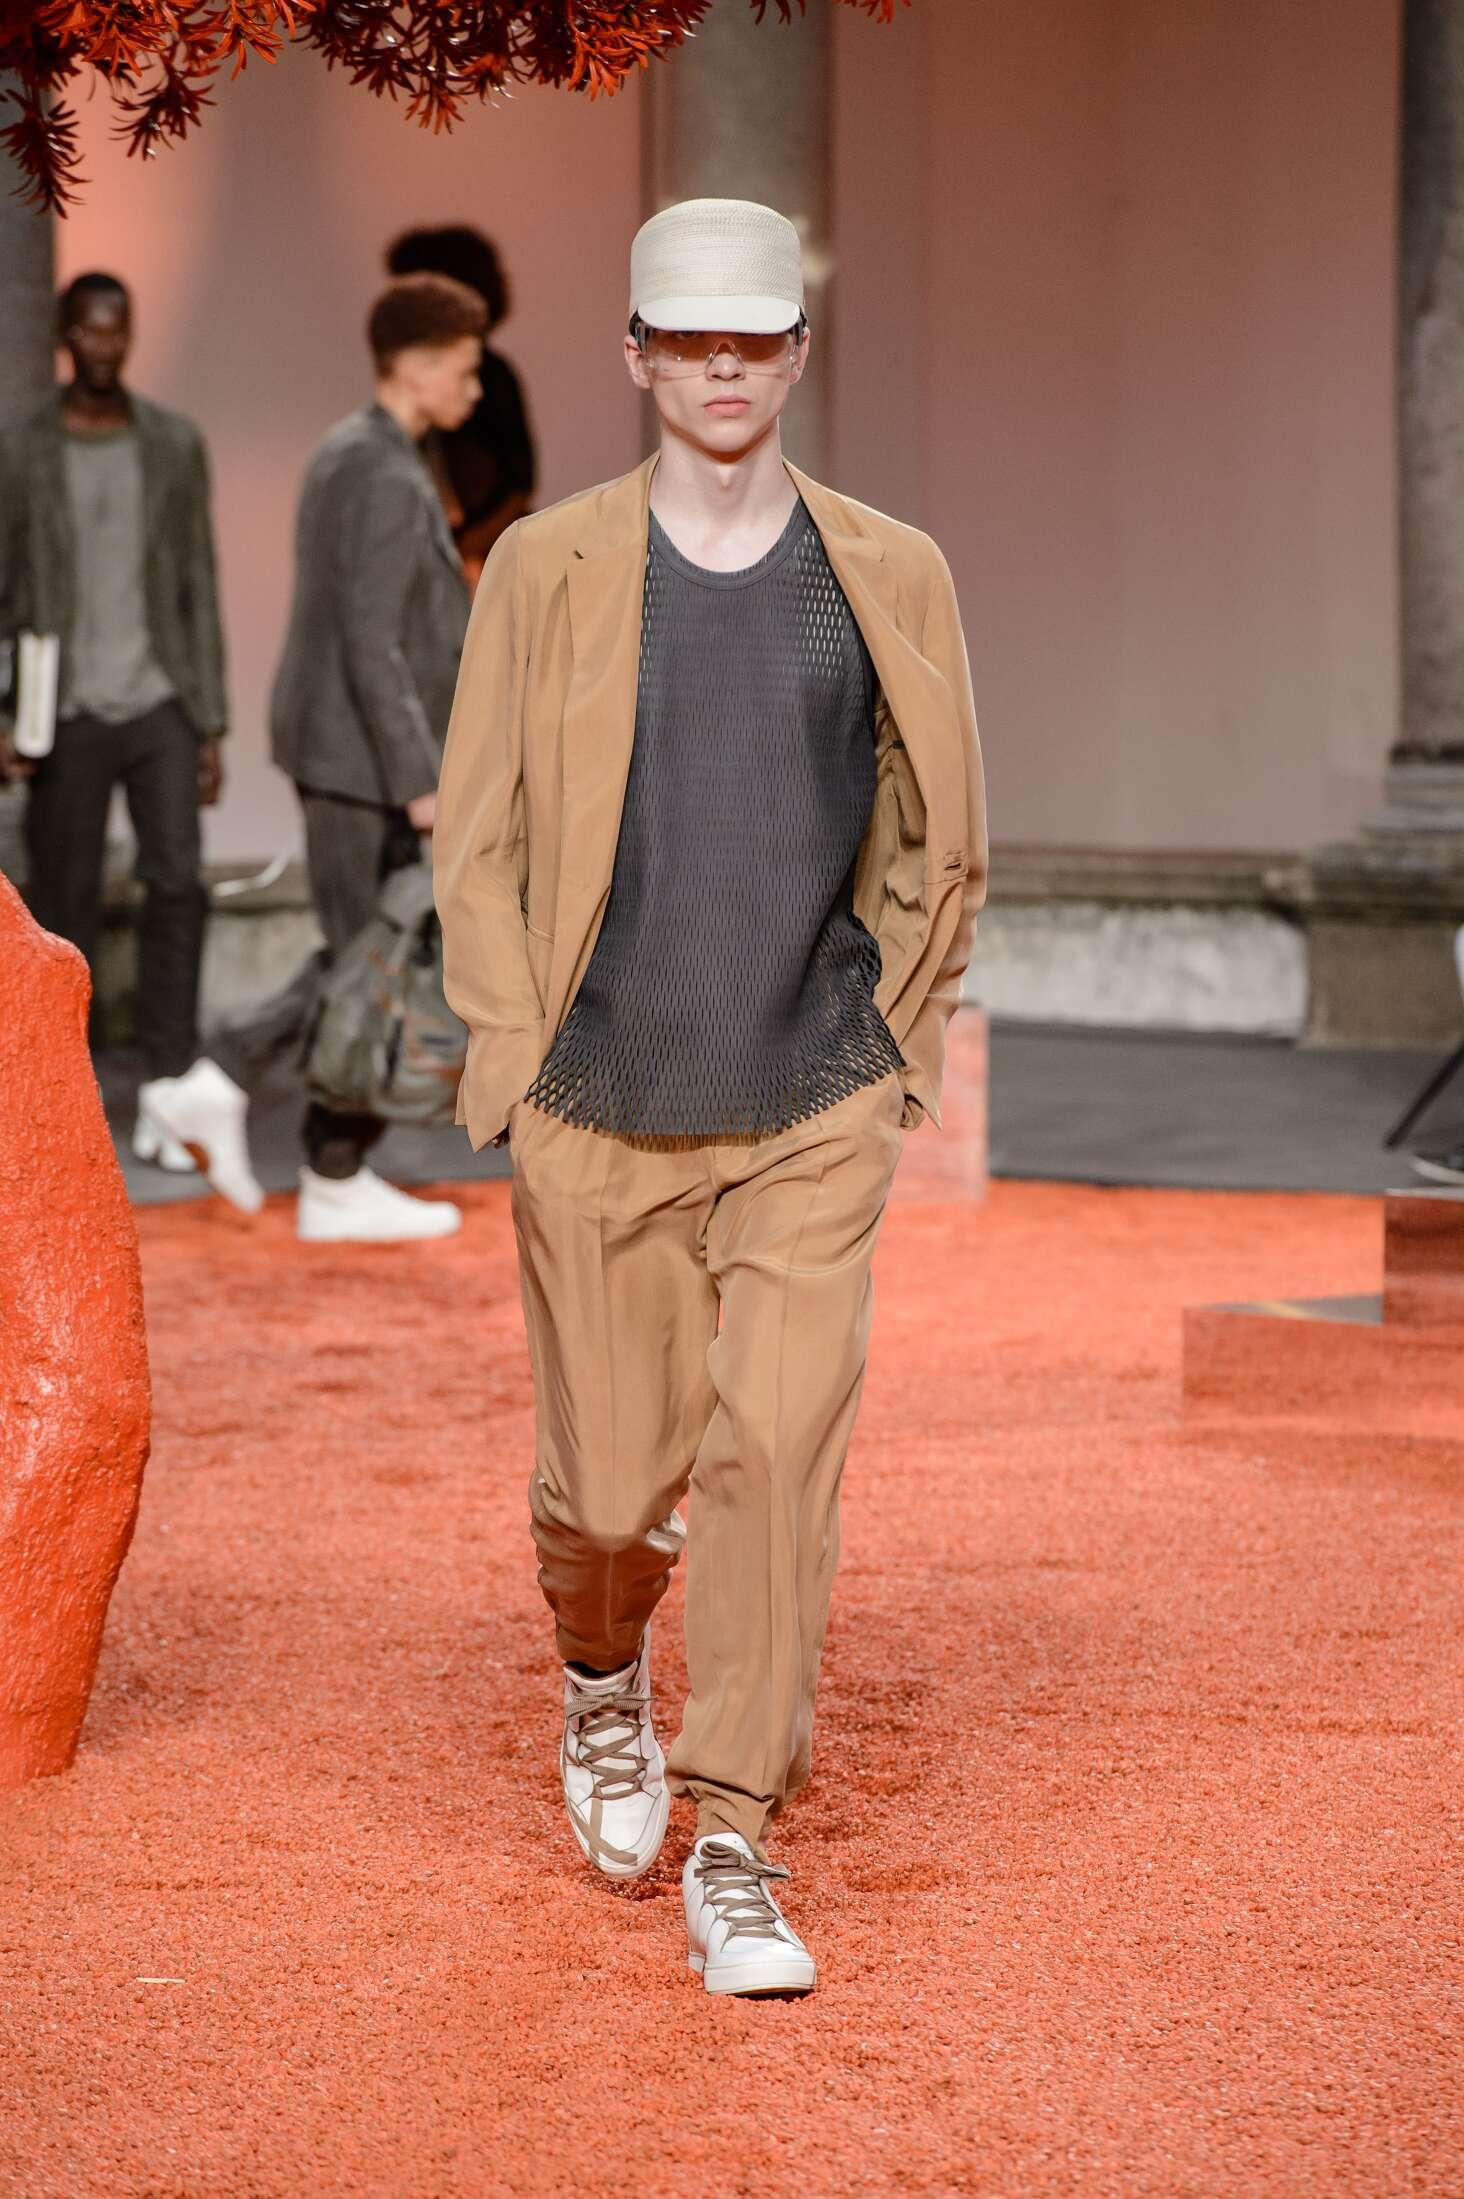 2018 Catwalk Ermenegildo Zegna Couture Man Fashion Show Summer